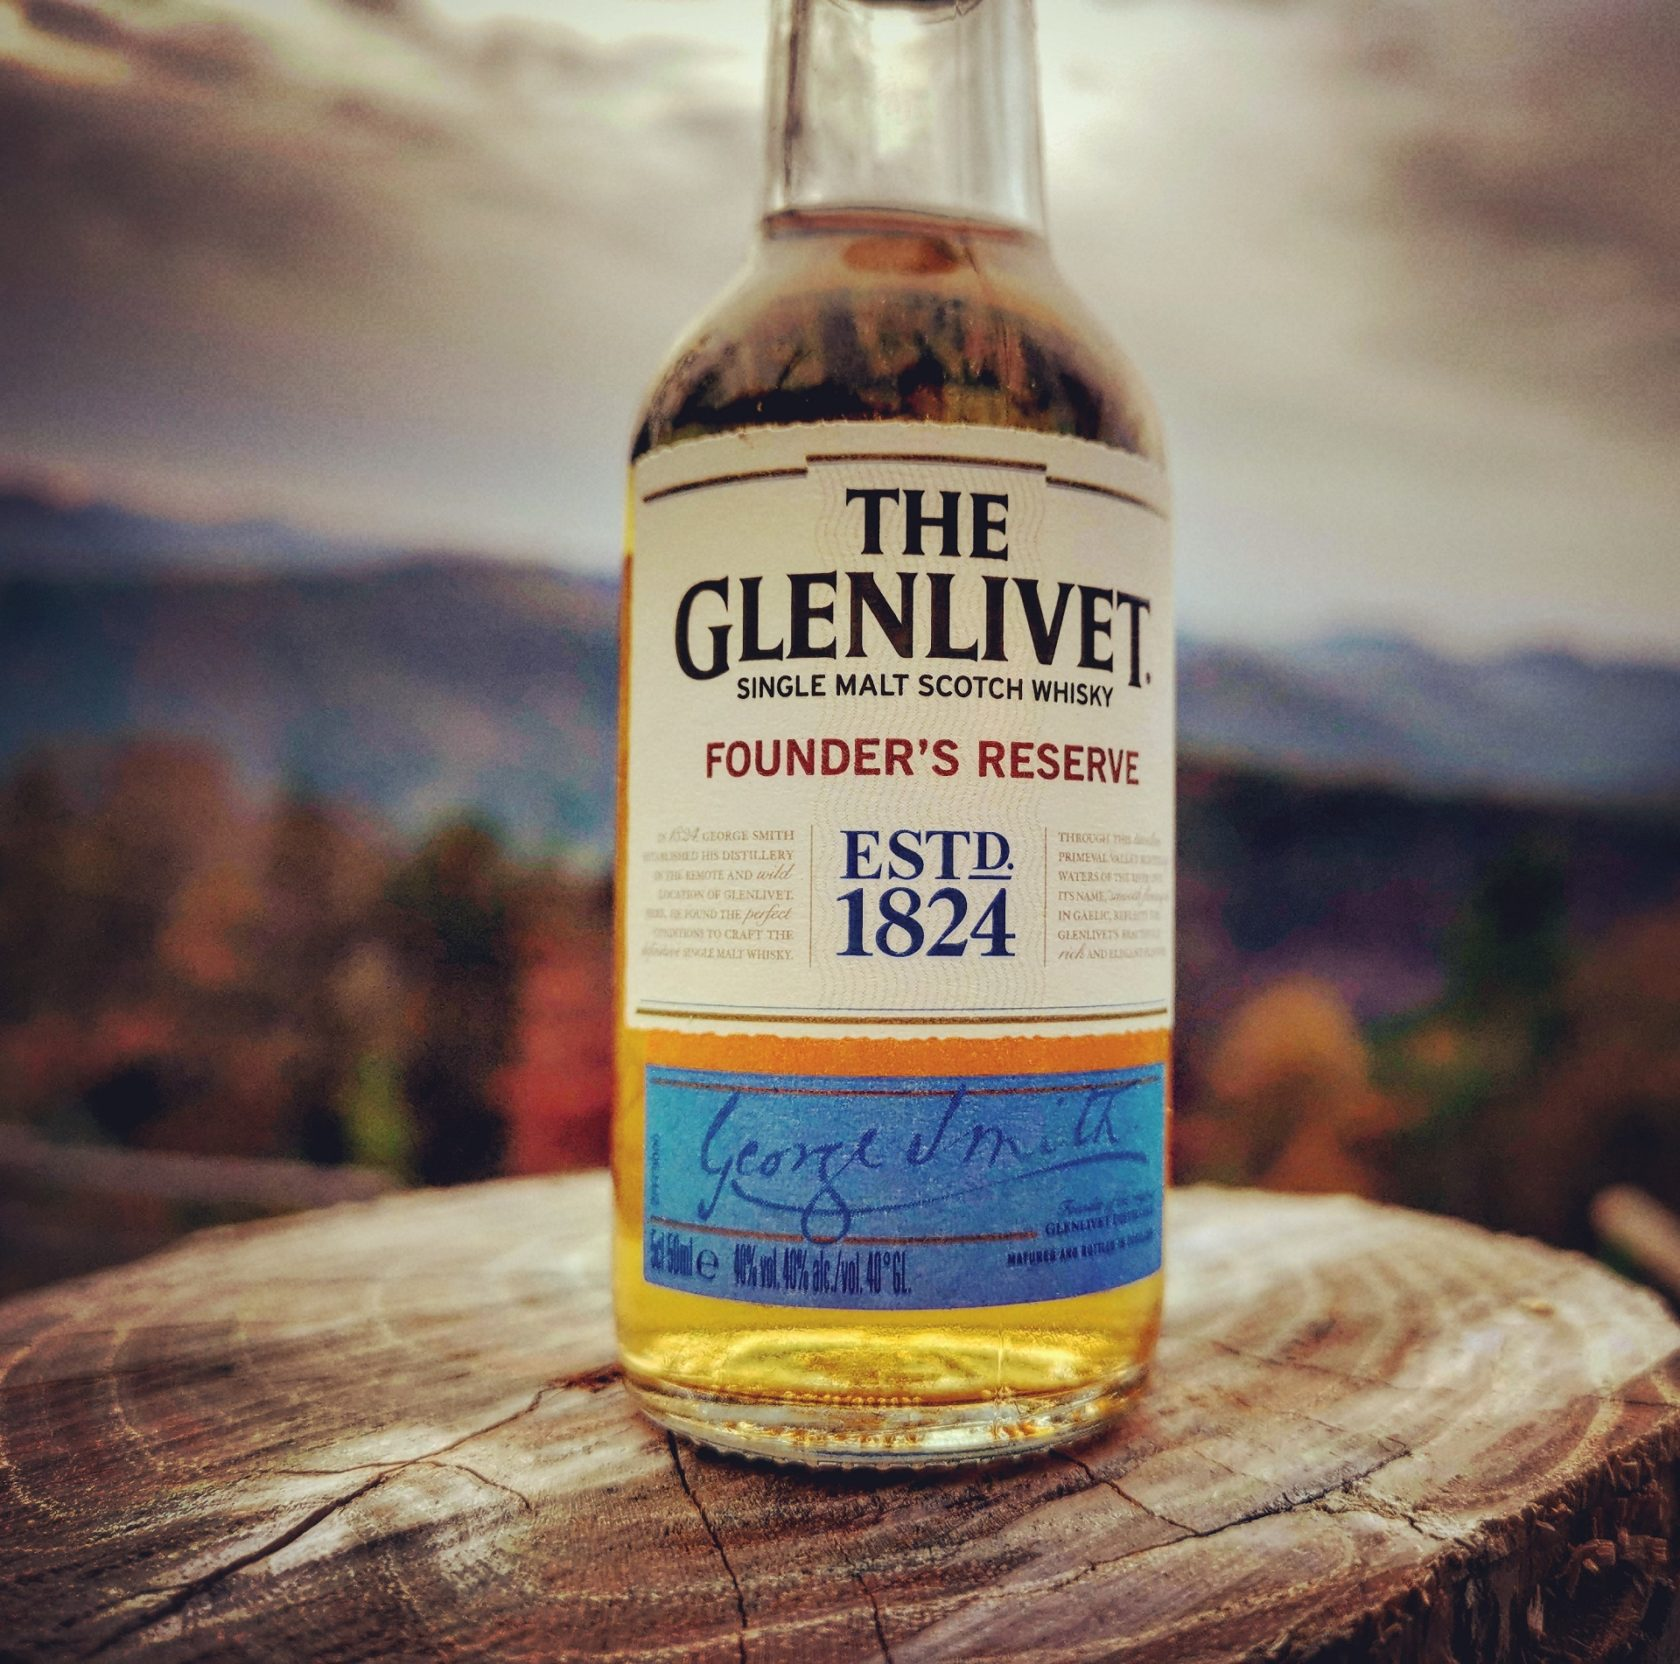 The Glenlivet Founder's Reserve Speyside Single Malt Scotch Whisky